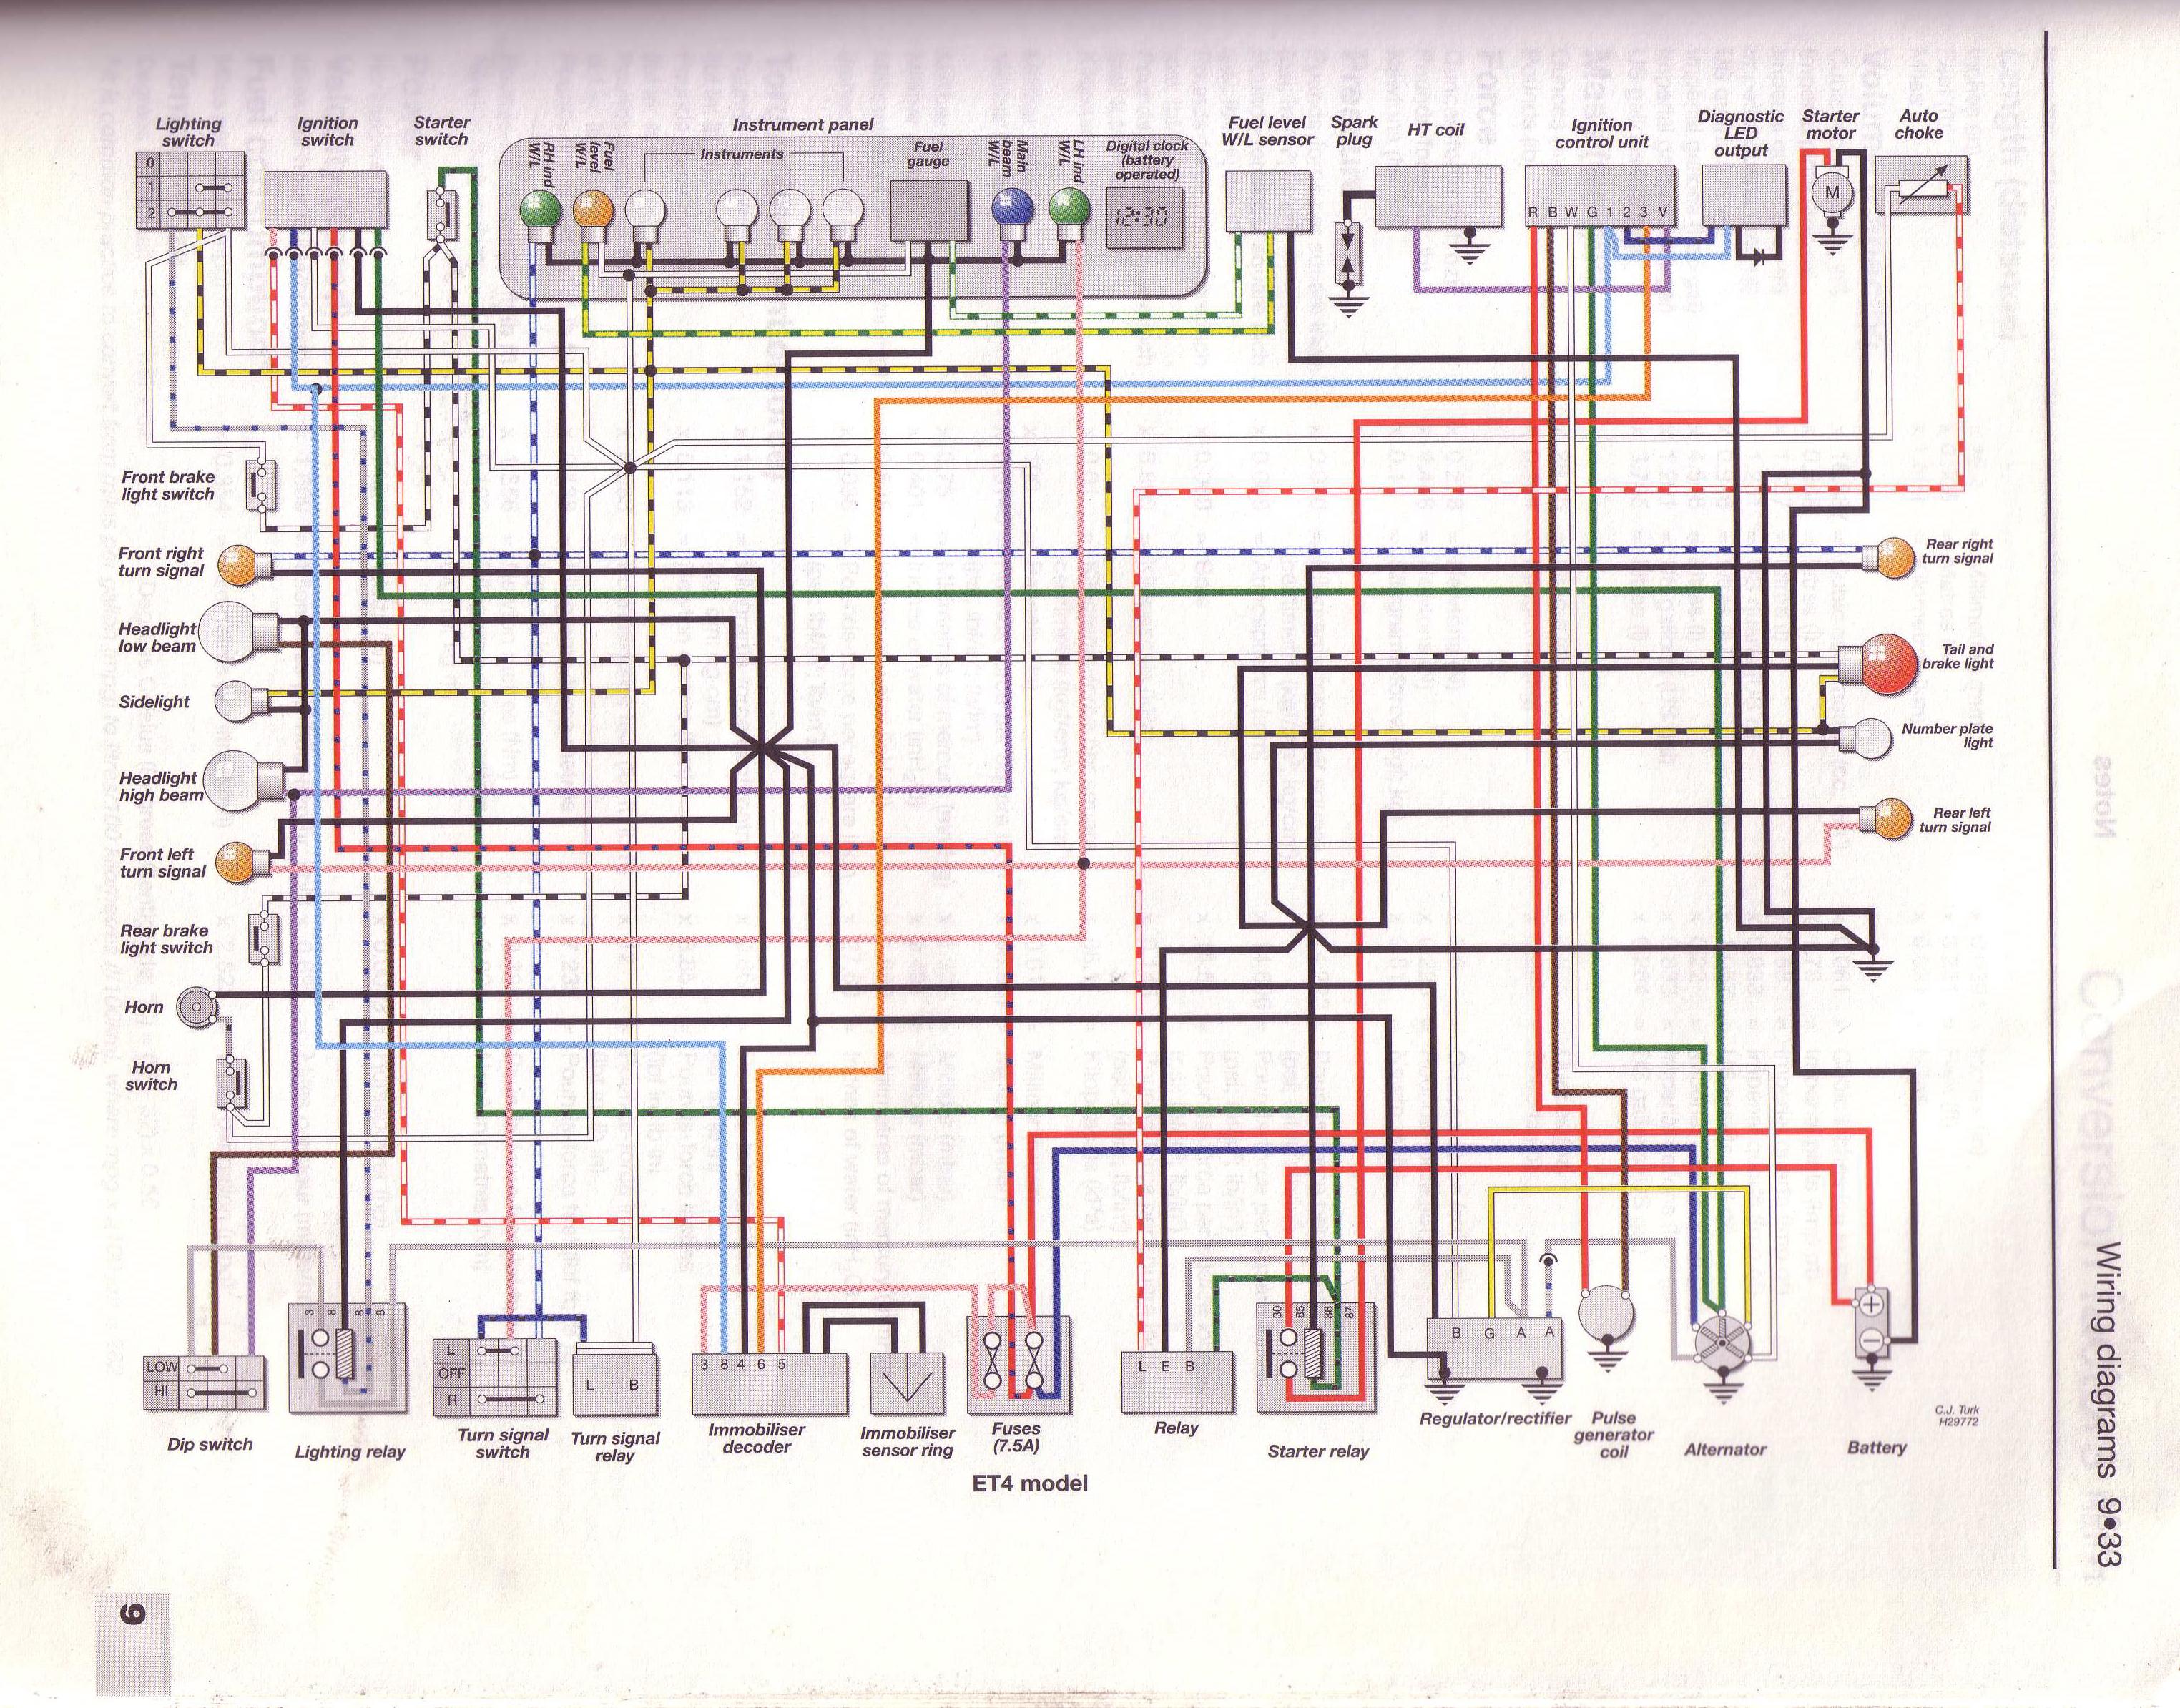 et4-wiringdiagram Vespa Lx Wiring Diagram on